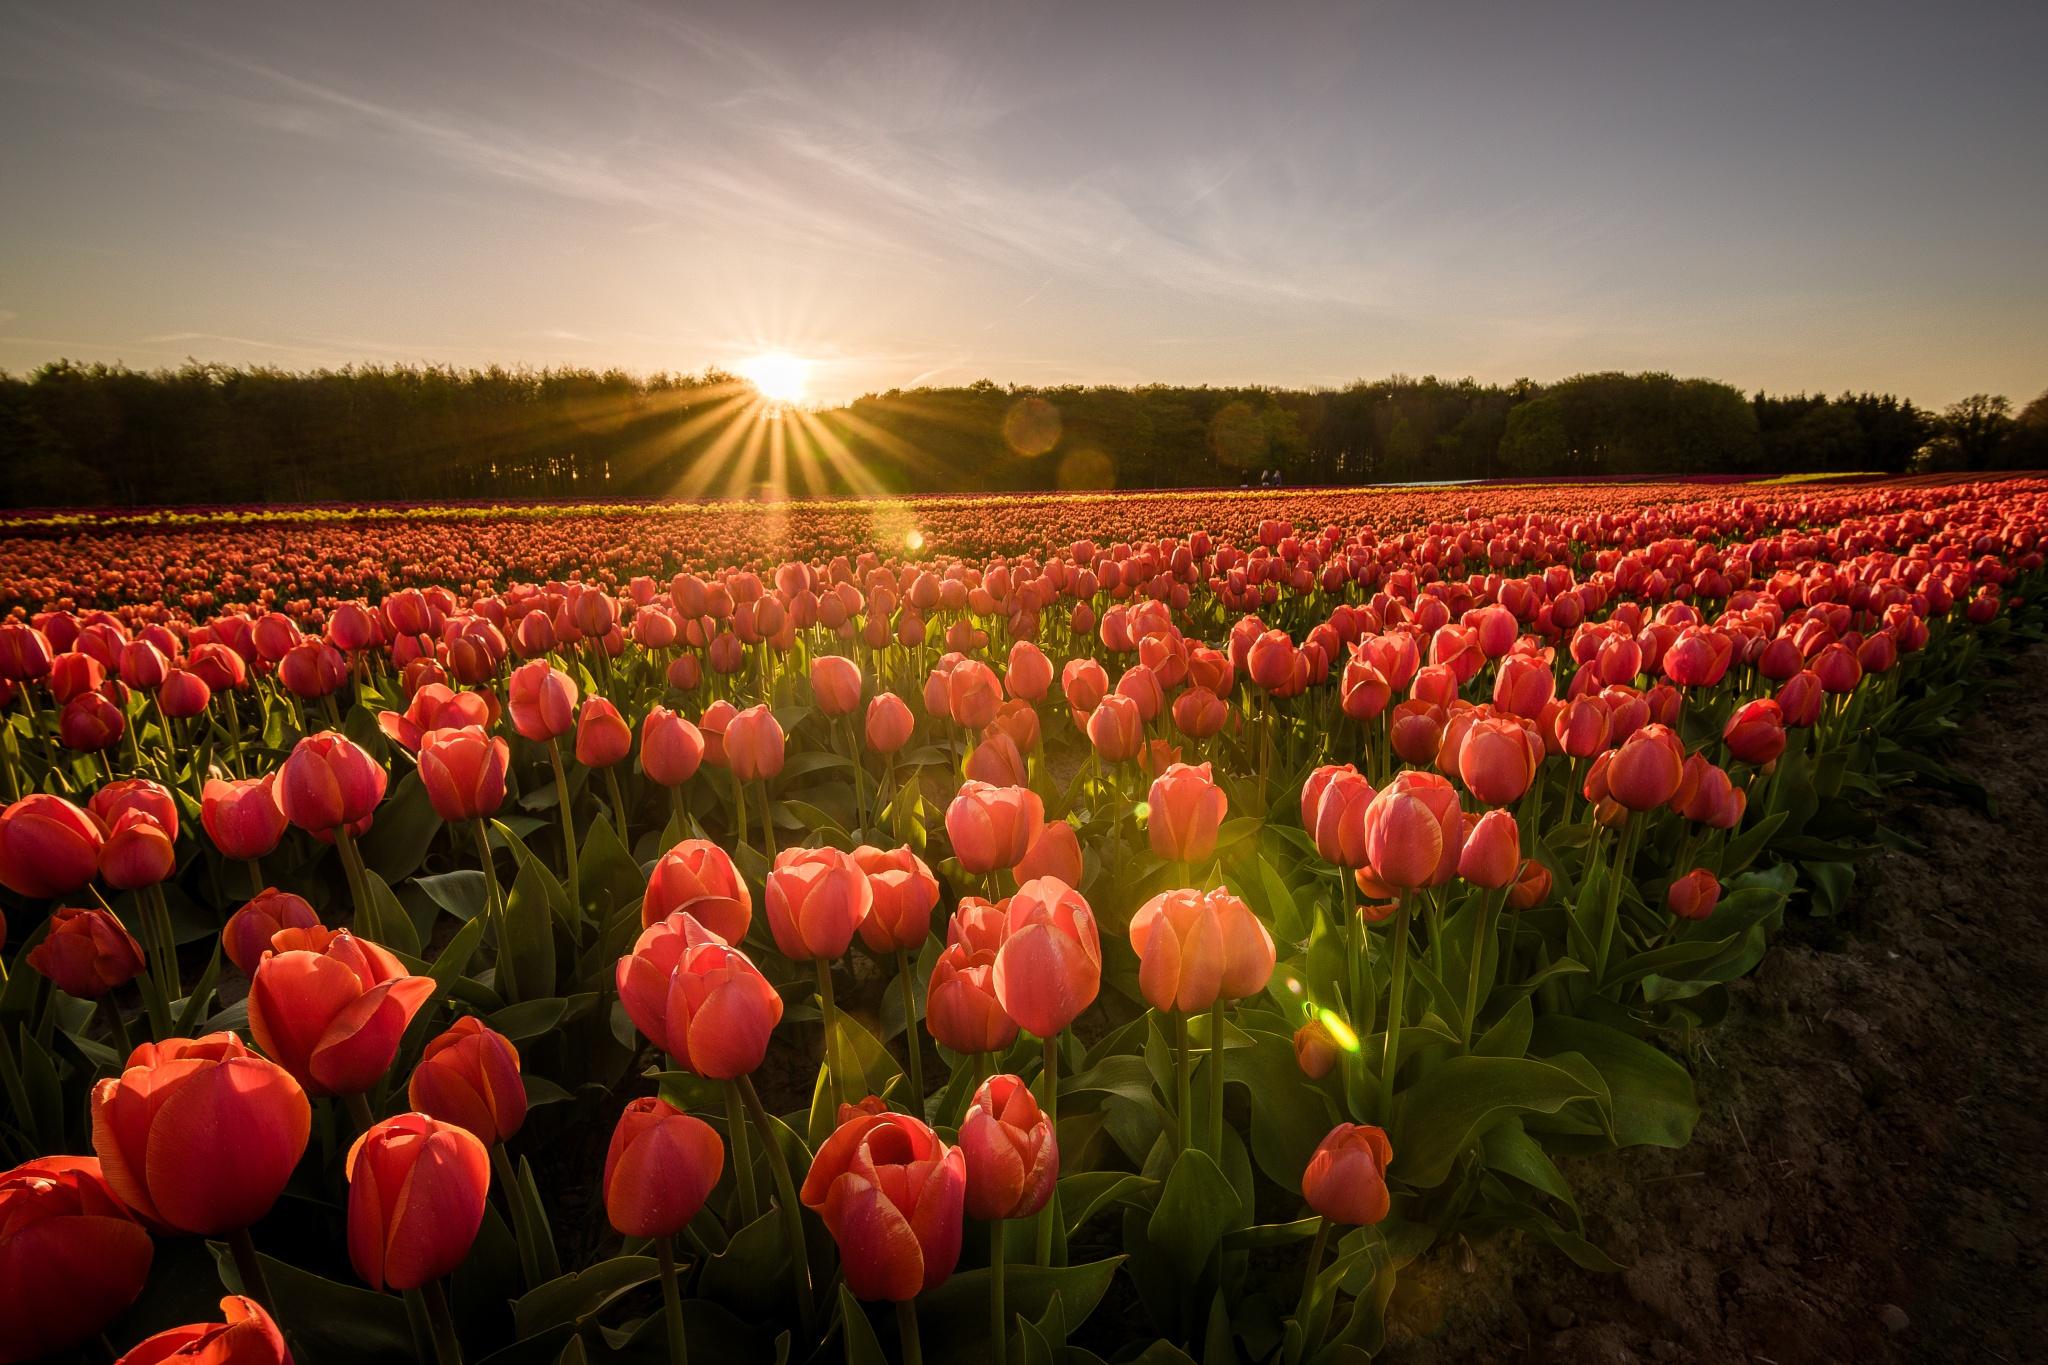 Tulips by Michael B. Rasmussen